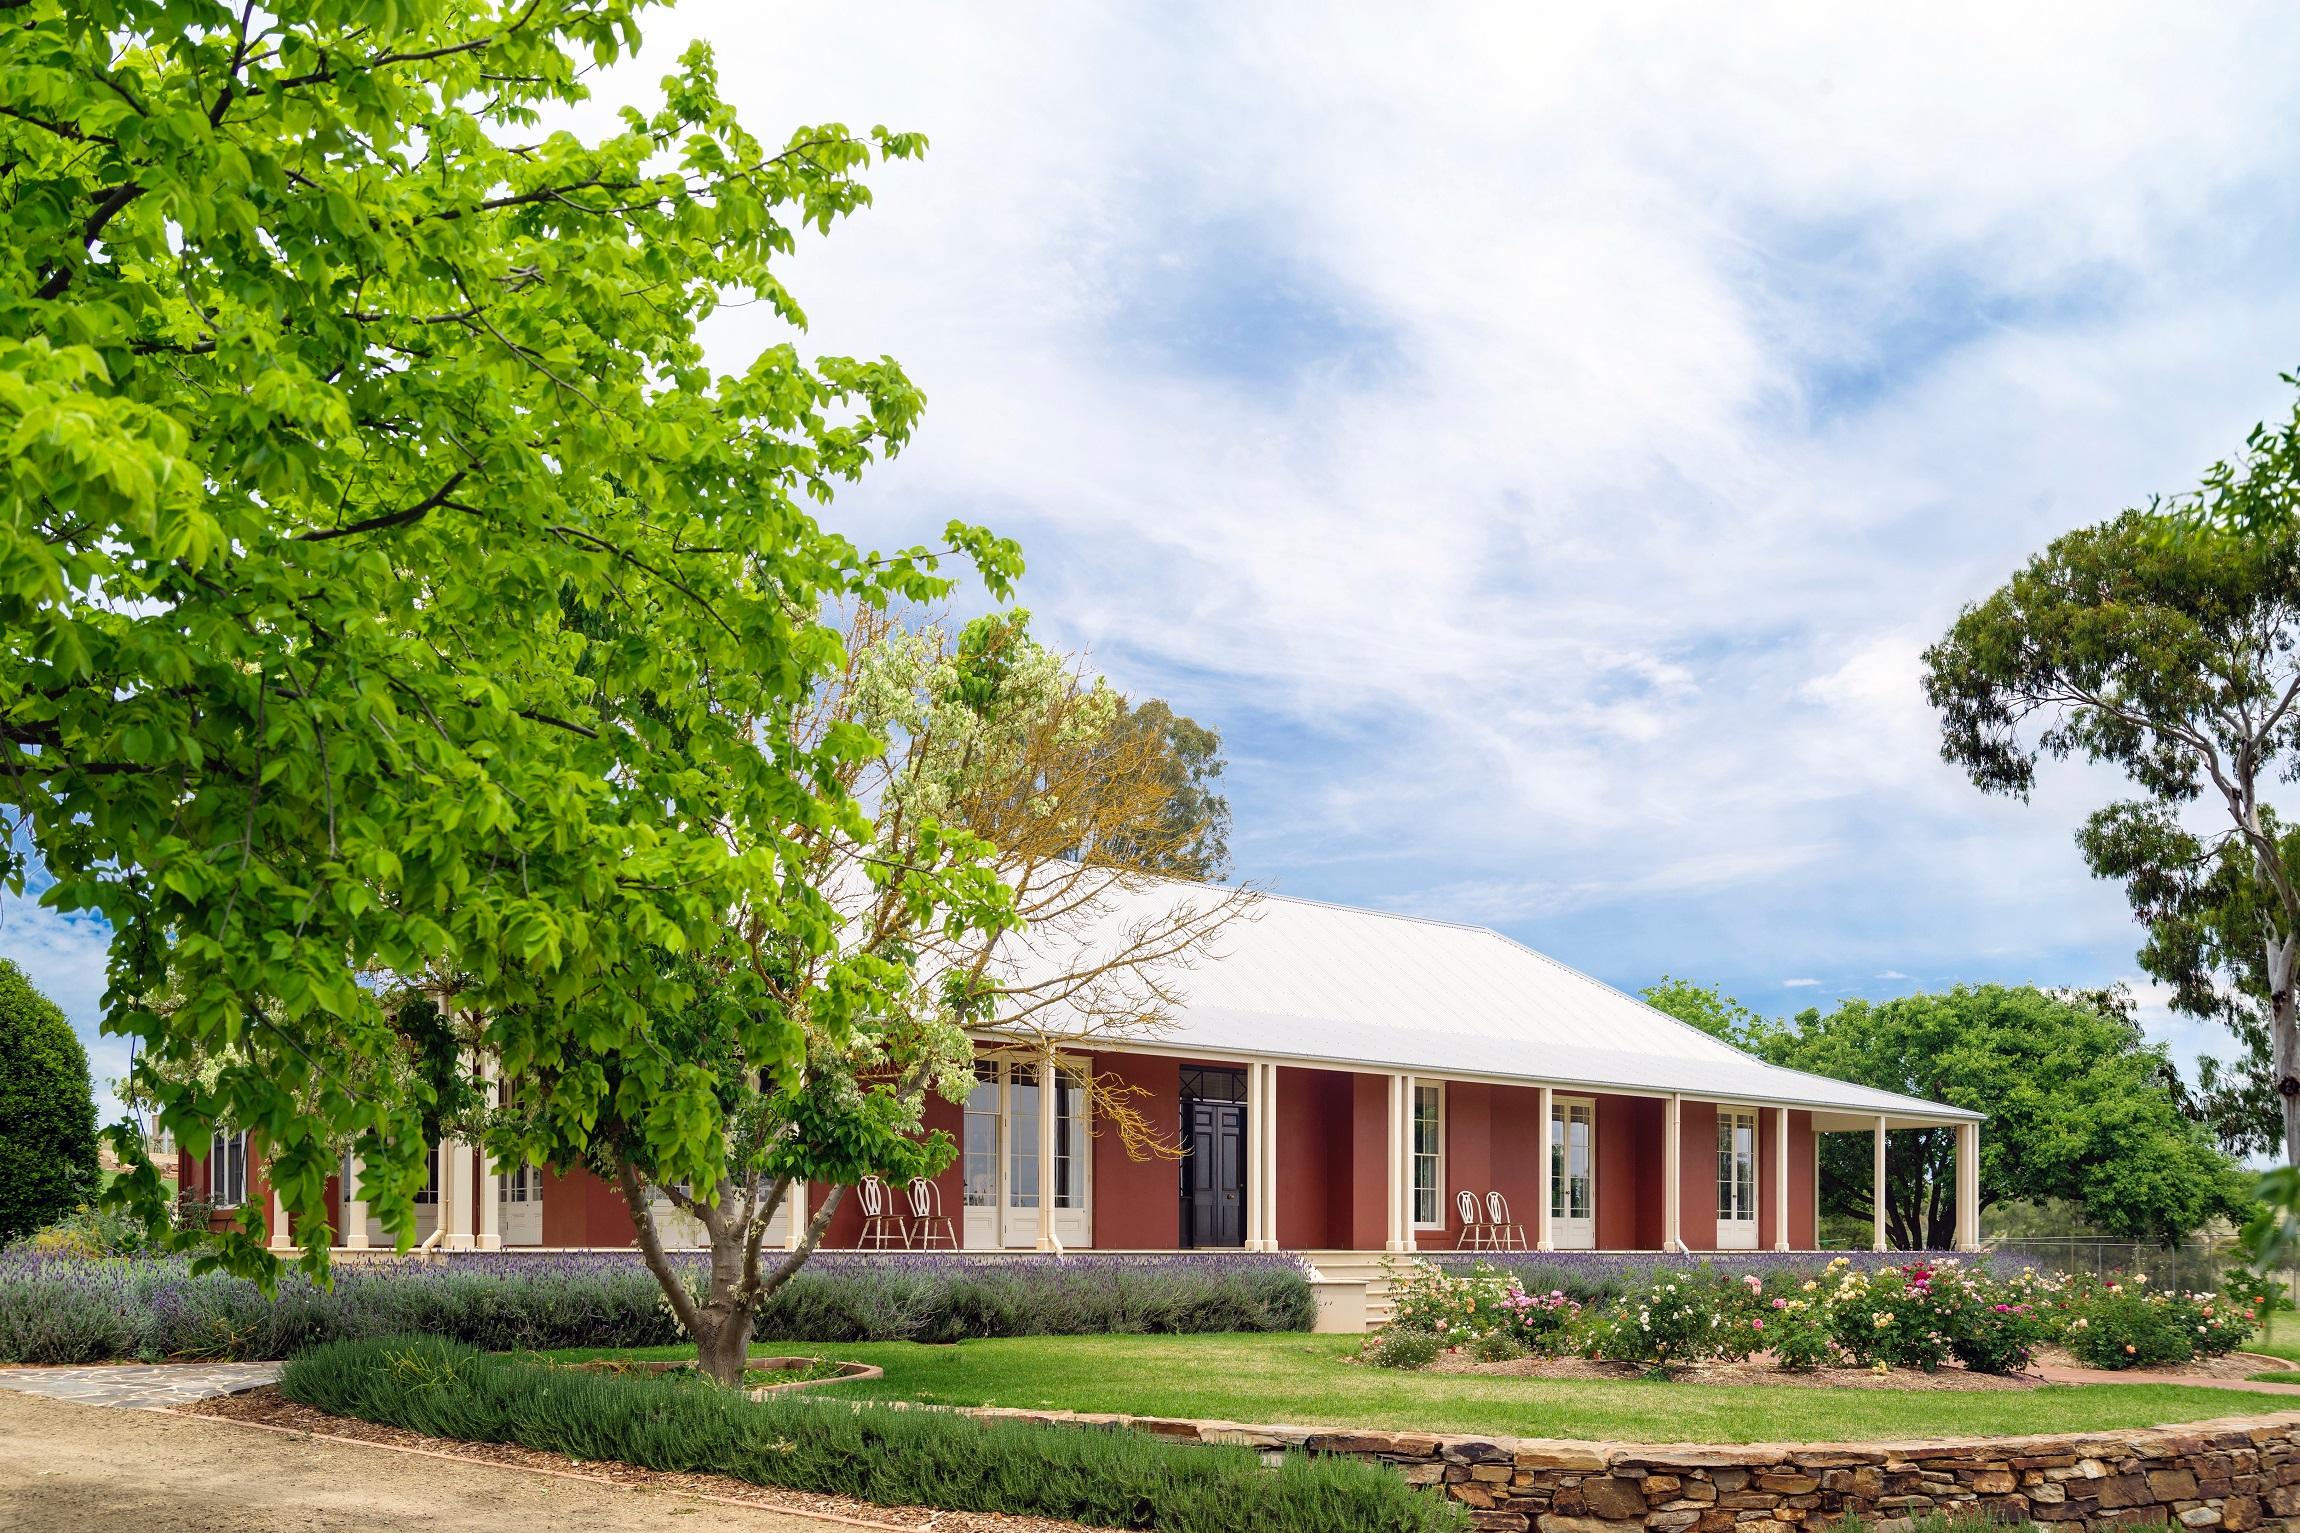 Country-Farmhouse-Australia-Wagga-Michael-Bell-Architects